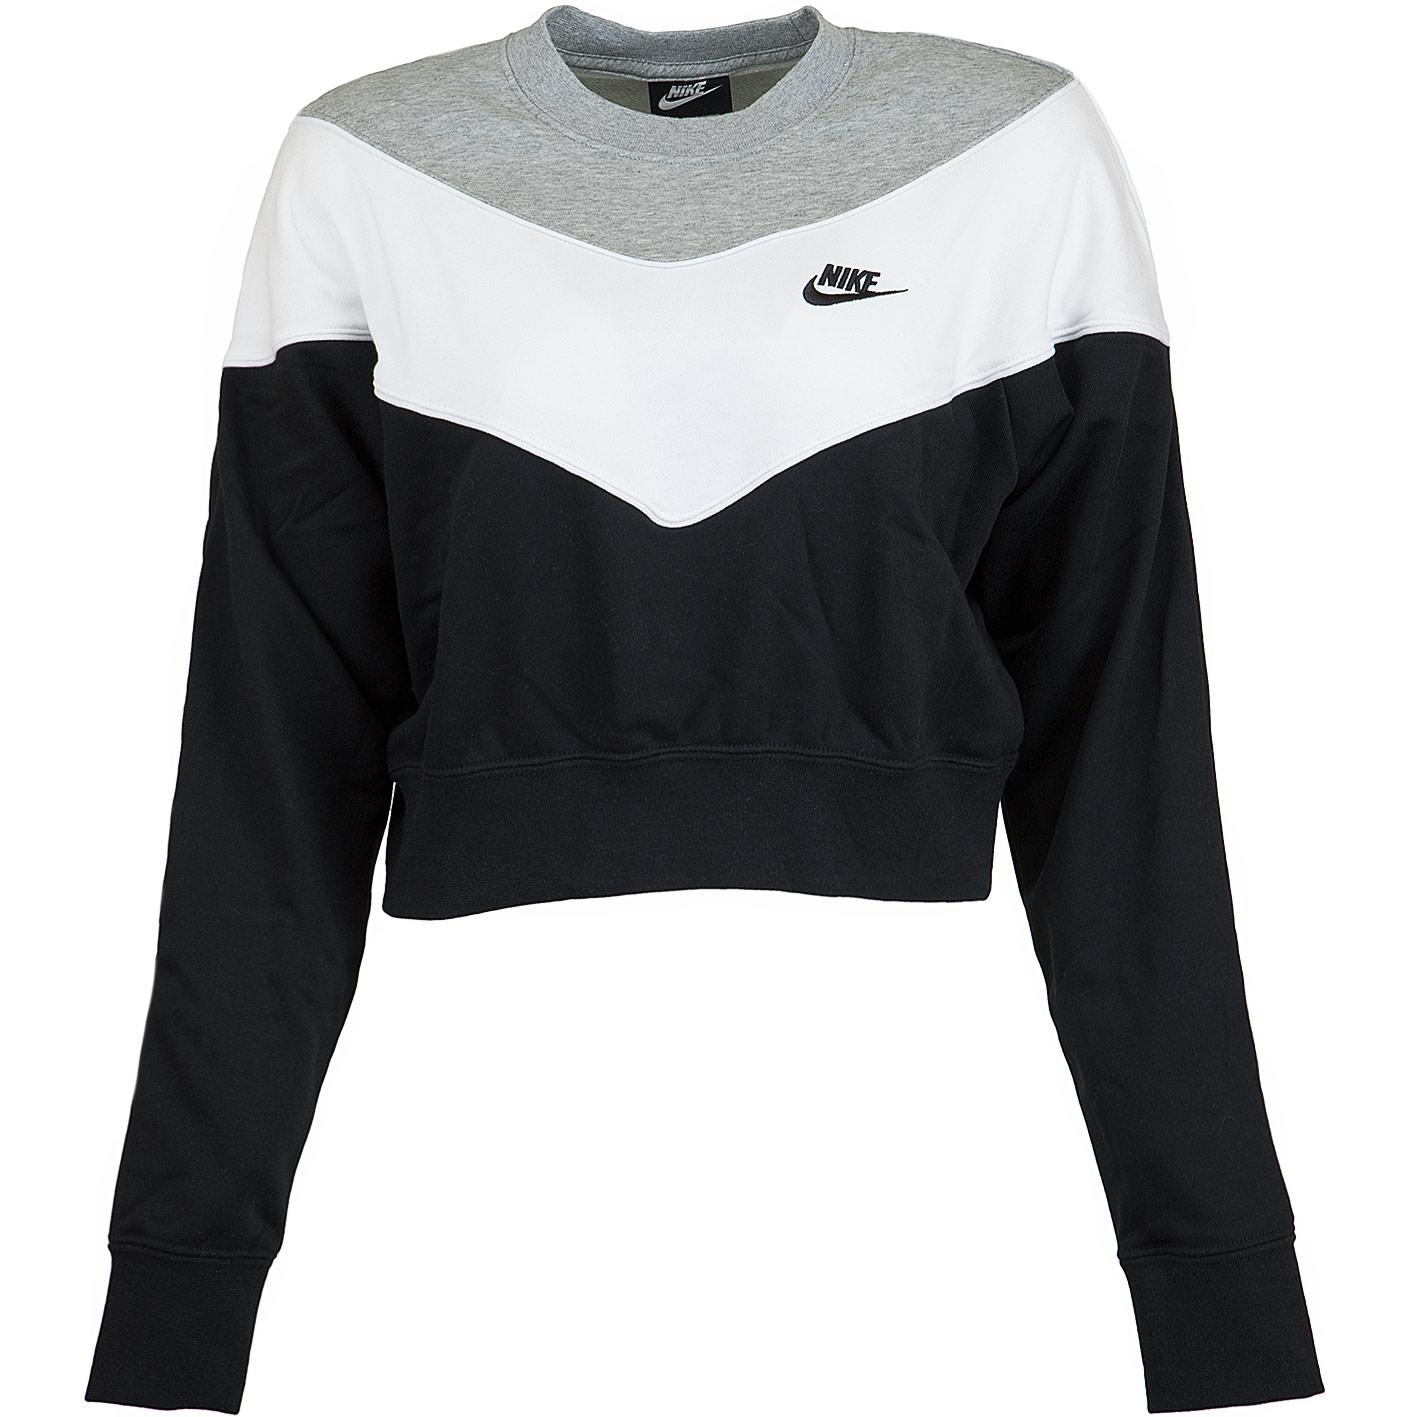 quality design d3636 6c6f7 Nike Damen Sweatshirt Heritage schwarz/weiß/grau